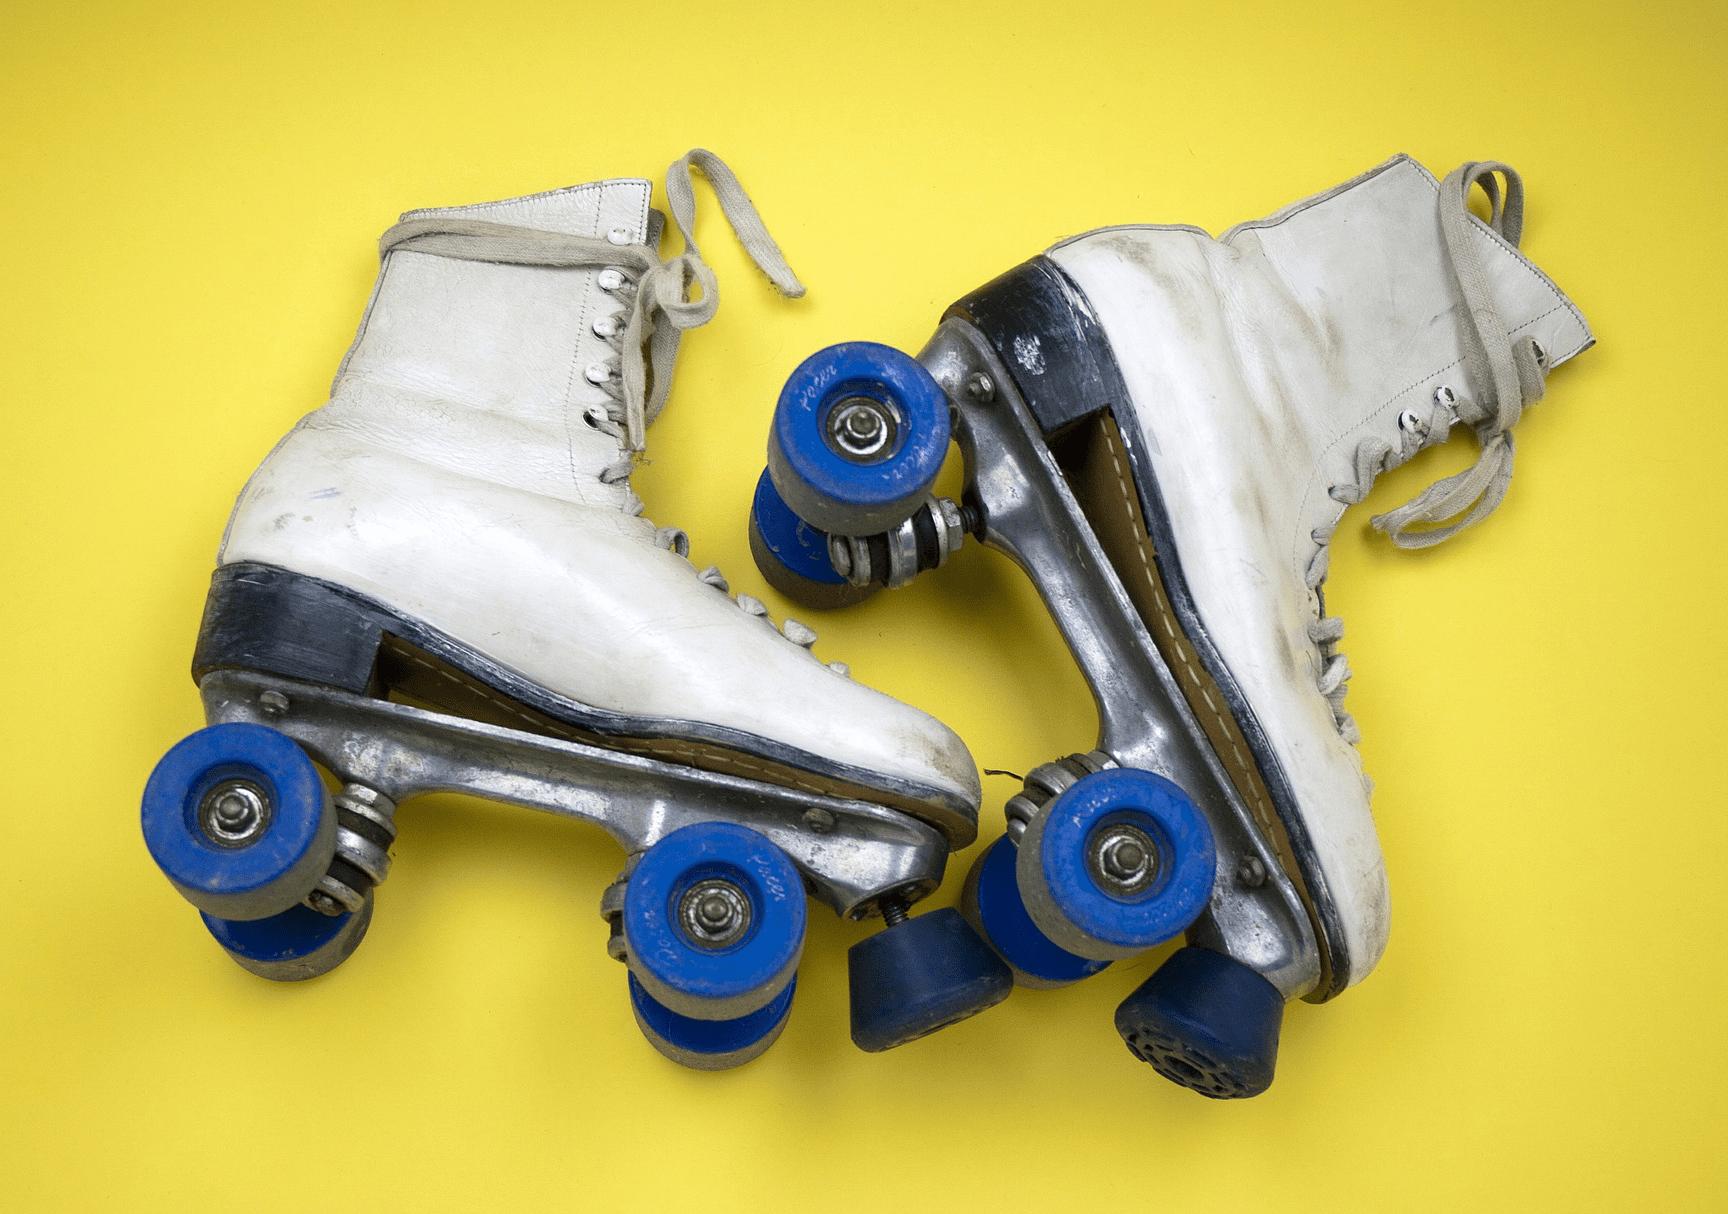 8 Best Roller Skate Wheels | Indoor & Outdoor Wheels Reviewed